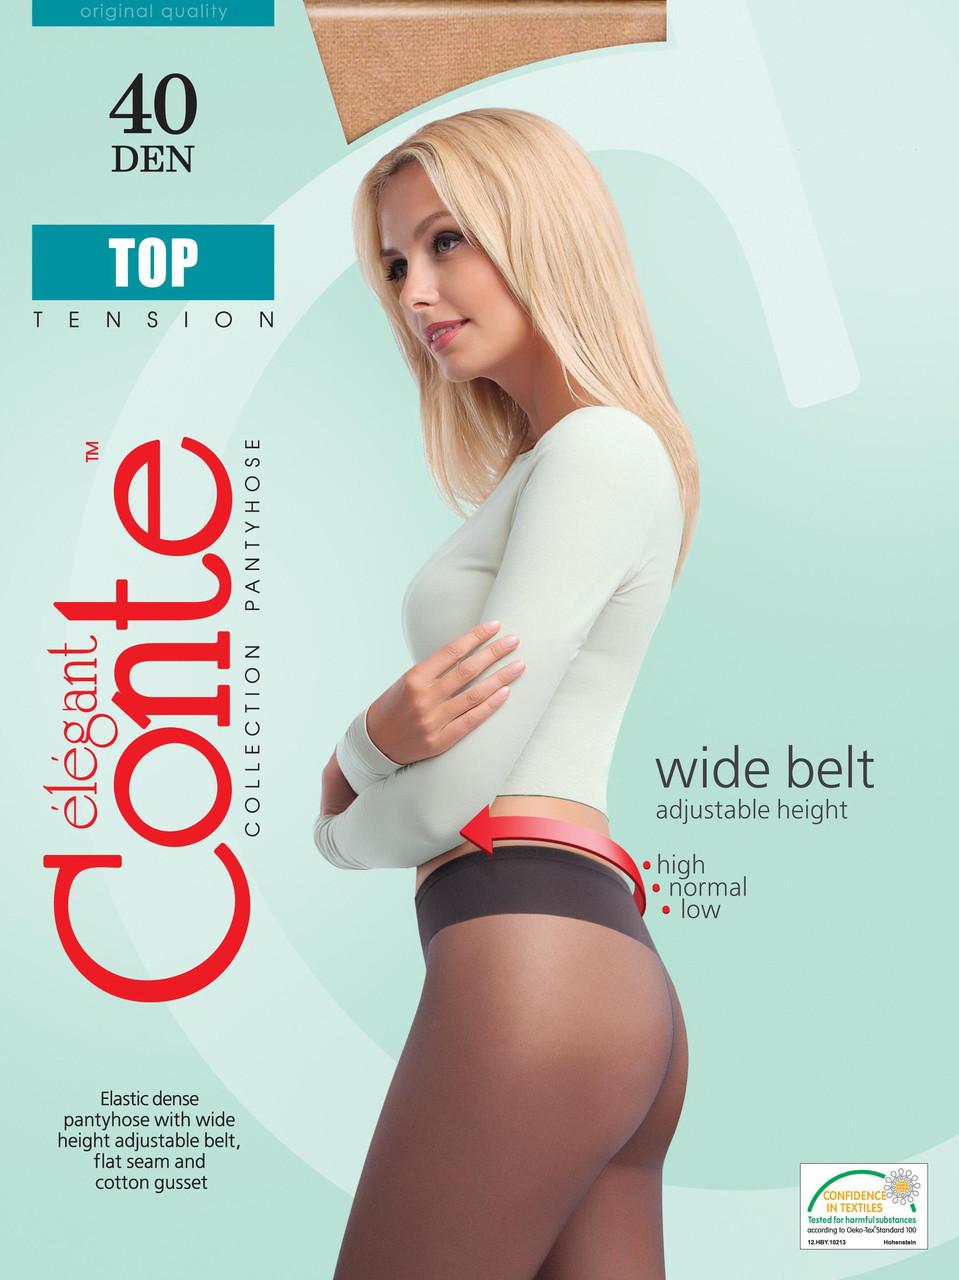 Колготки жіночі Conte ТОР 40 ден (Конте Топ 40 ден), розмір 2-4, Білорусія